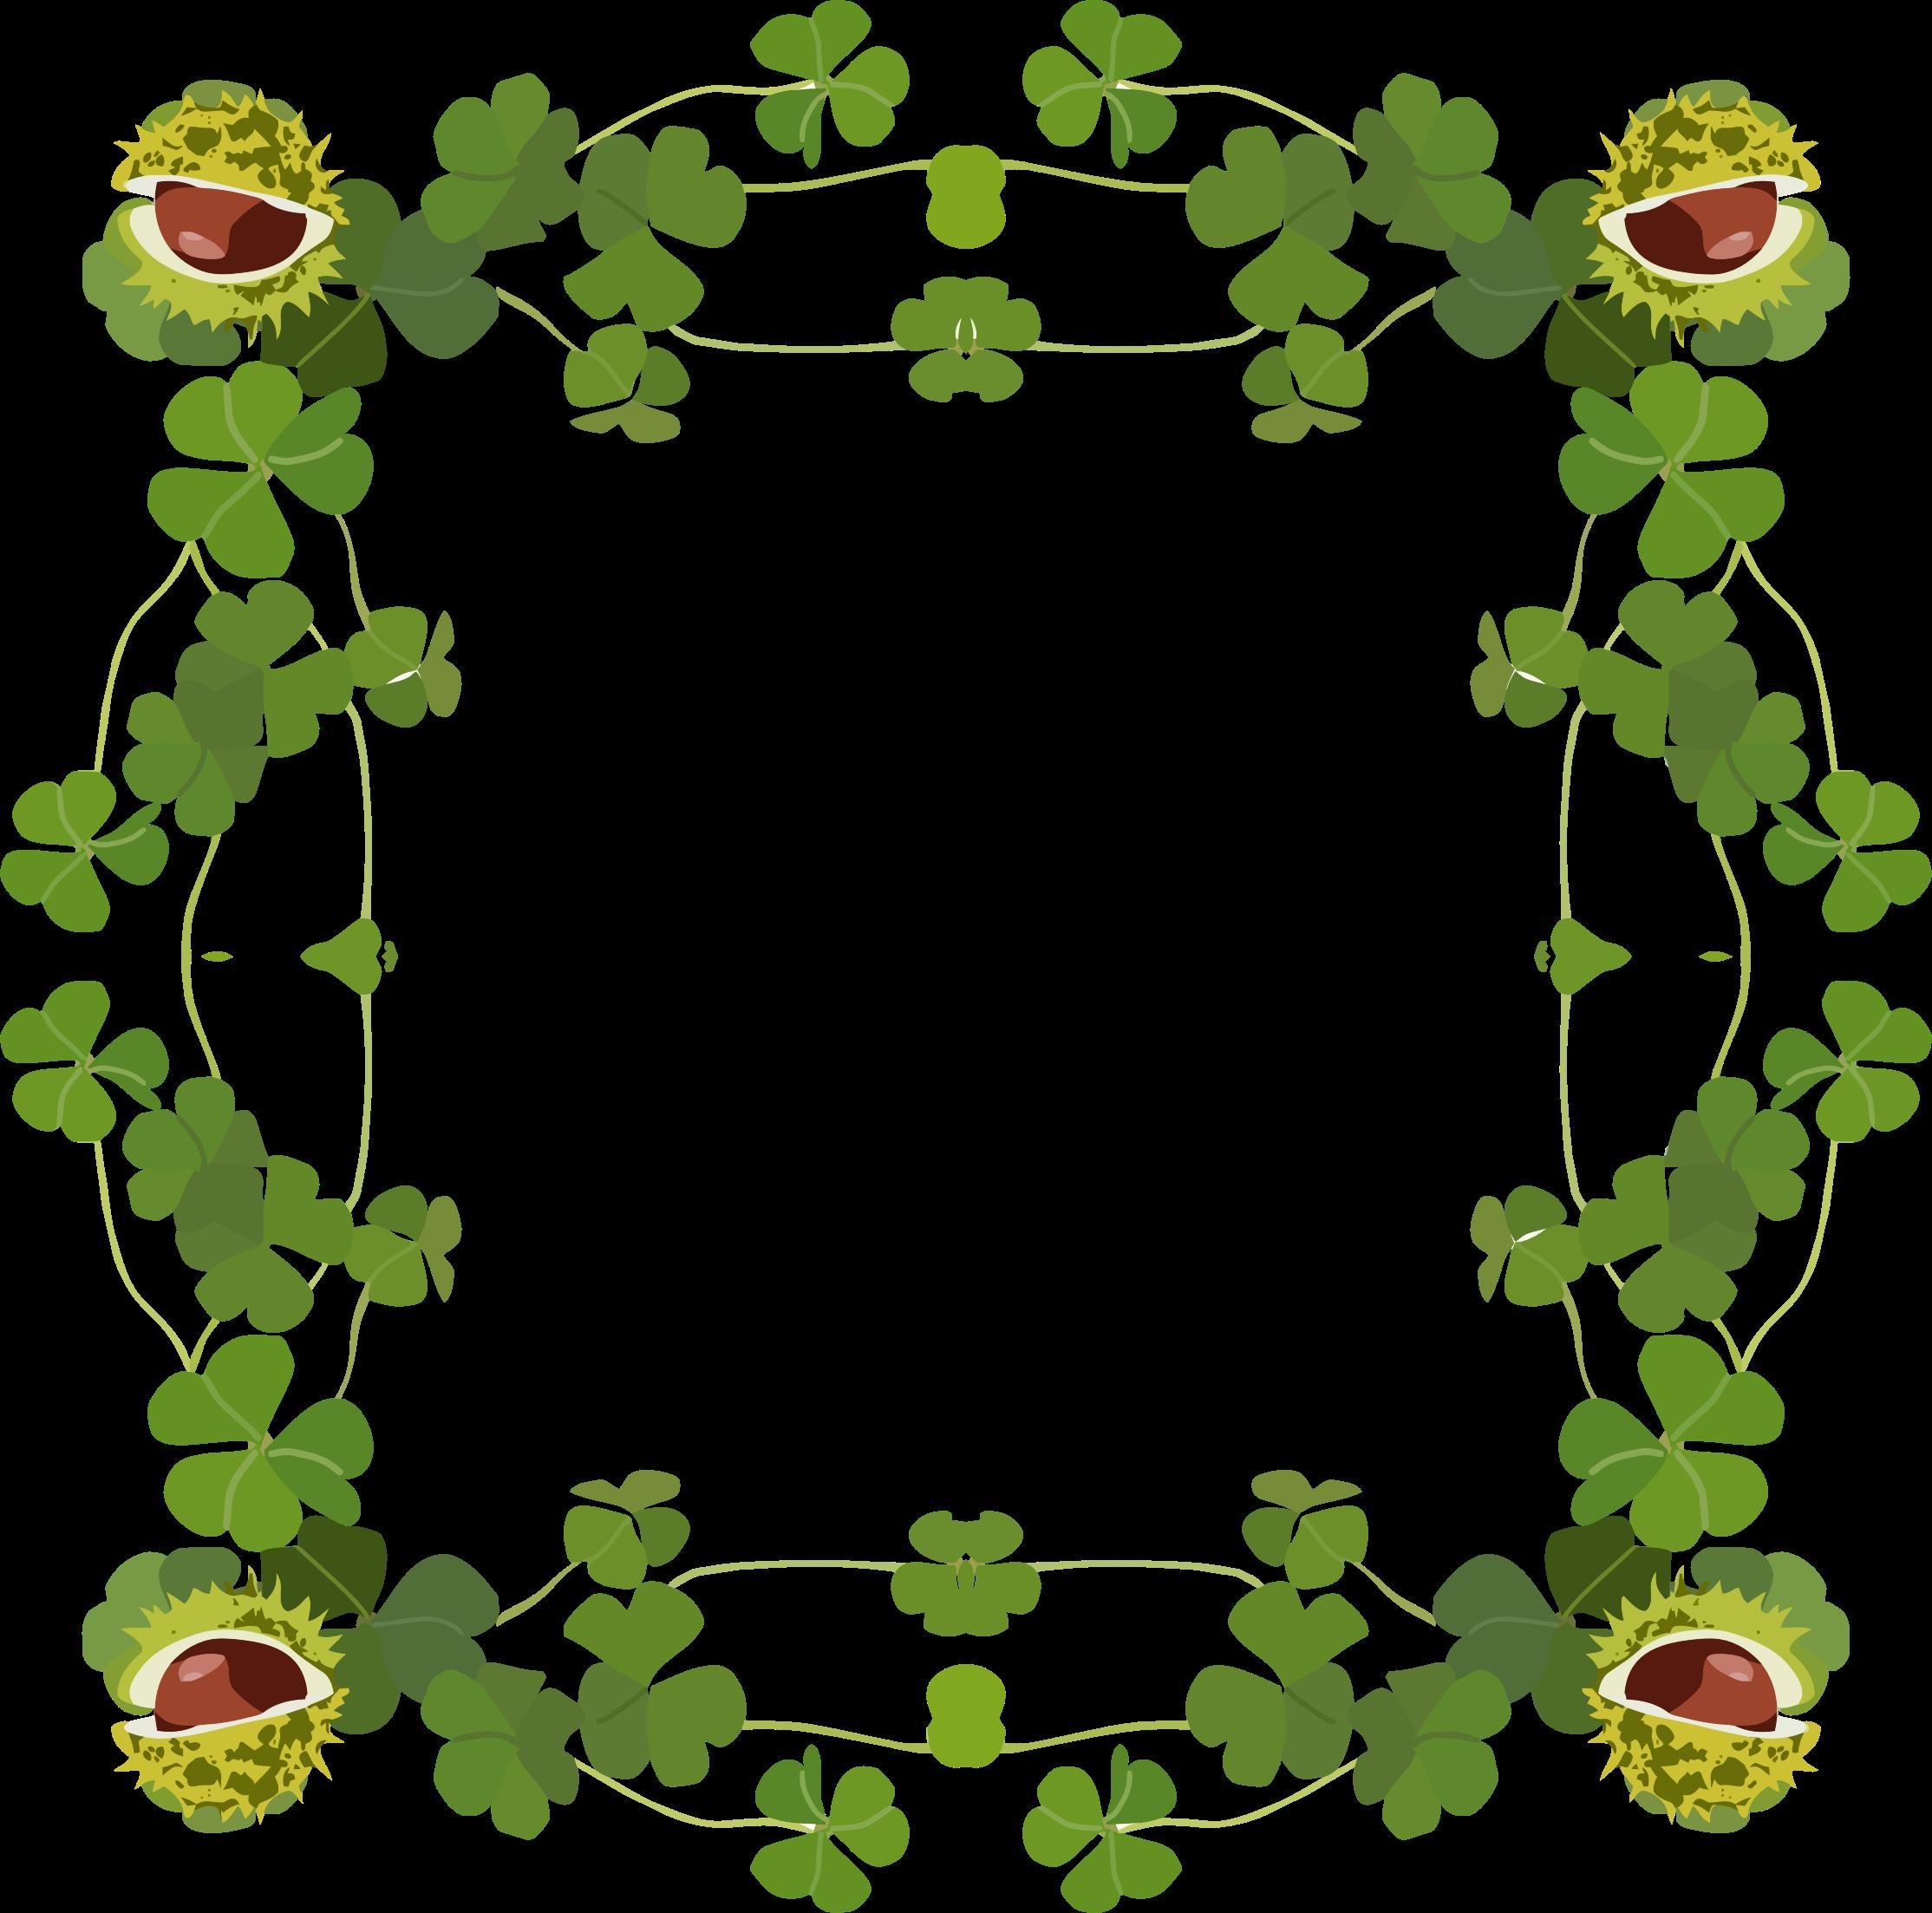 Clover clipart four leaf clover Frame Clover Clover Frame Clipart